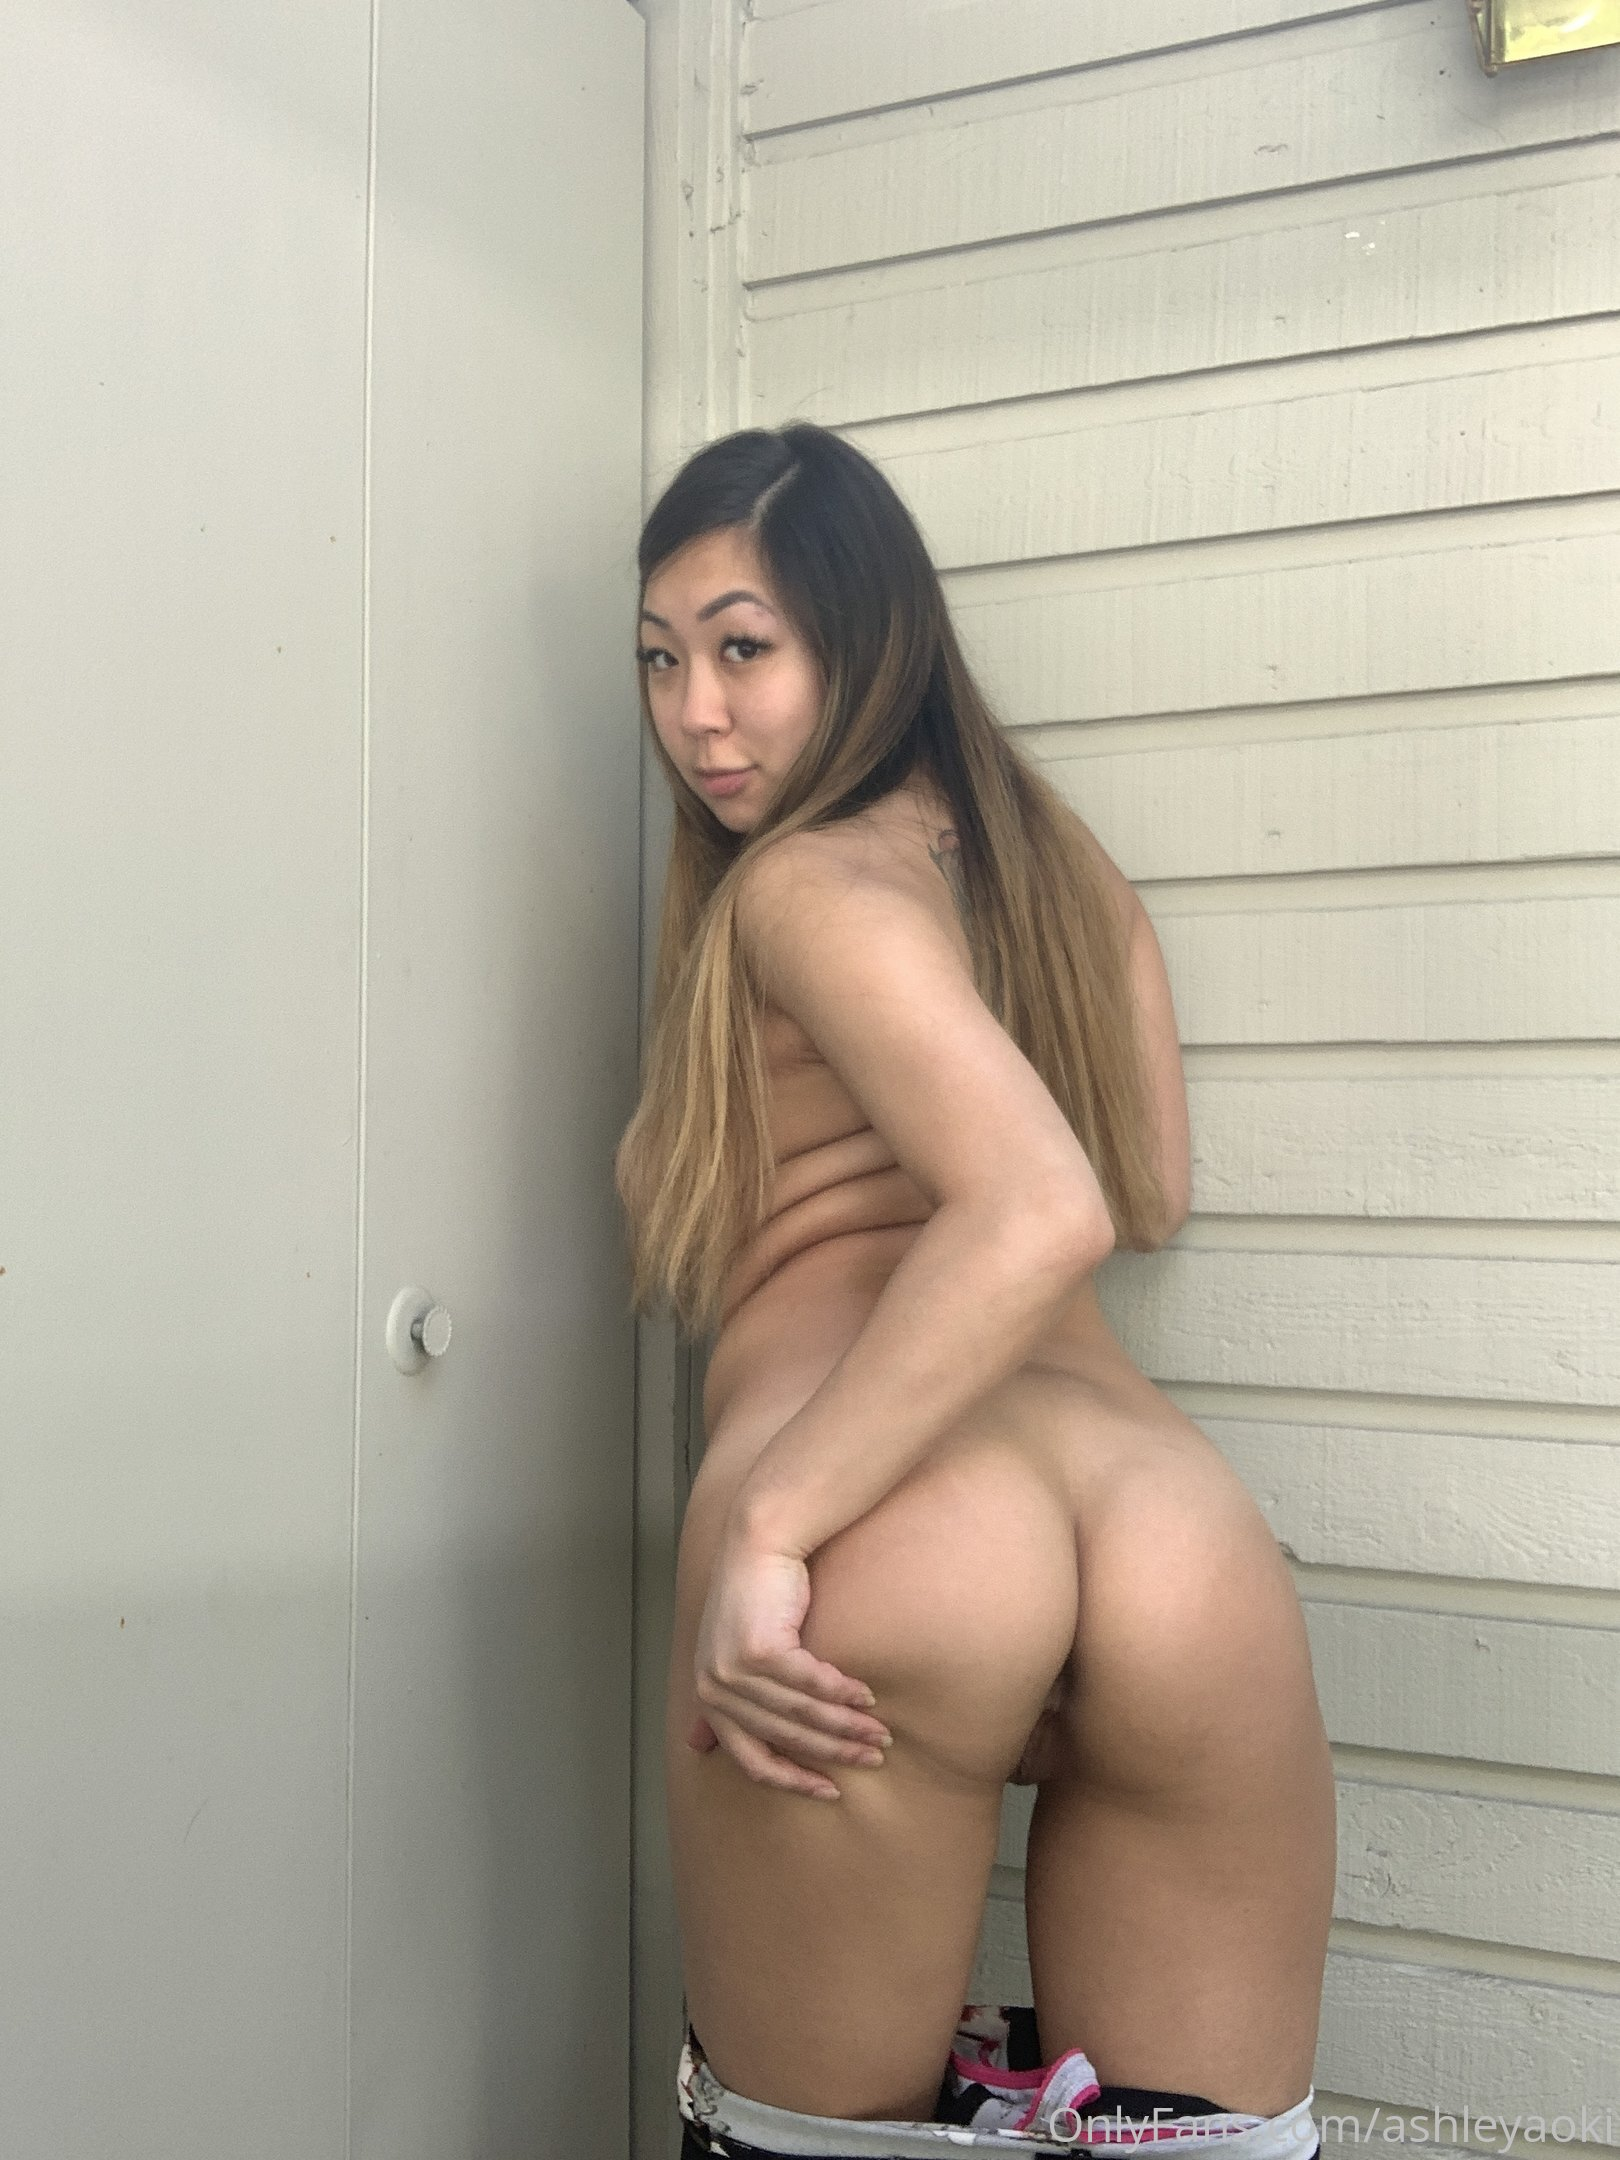 Ashley Aoki, Ashleyaoki, Onlyfans Leaks 0204